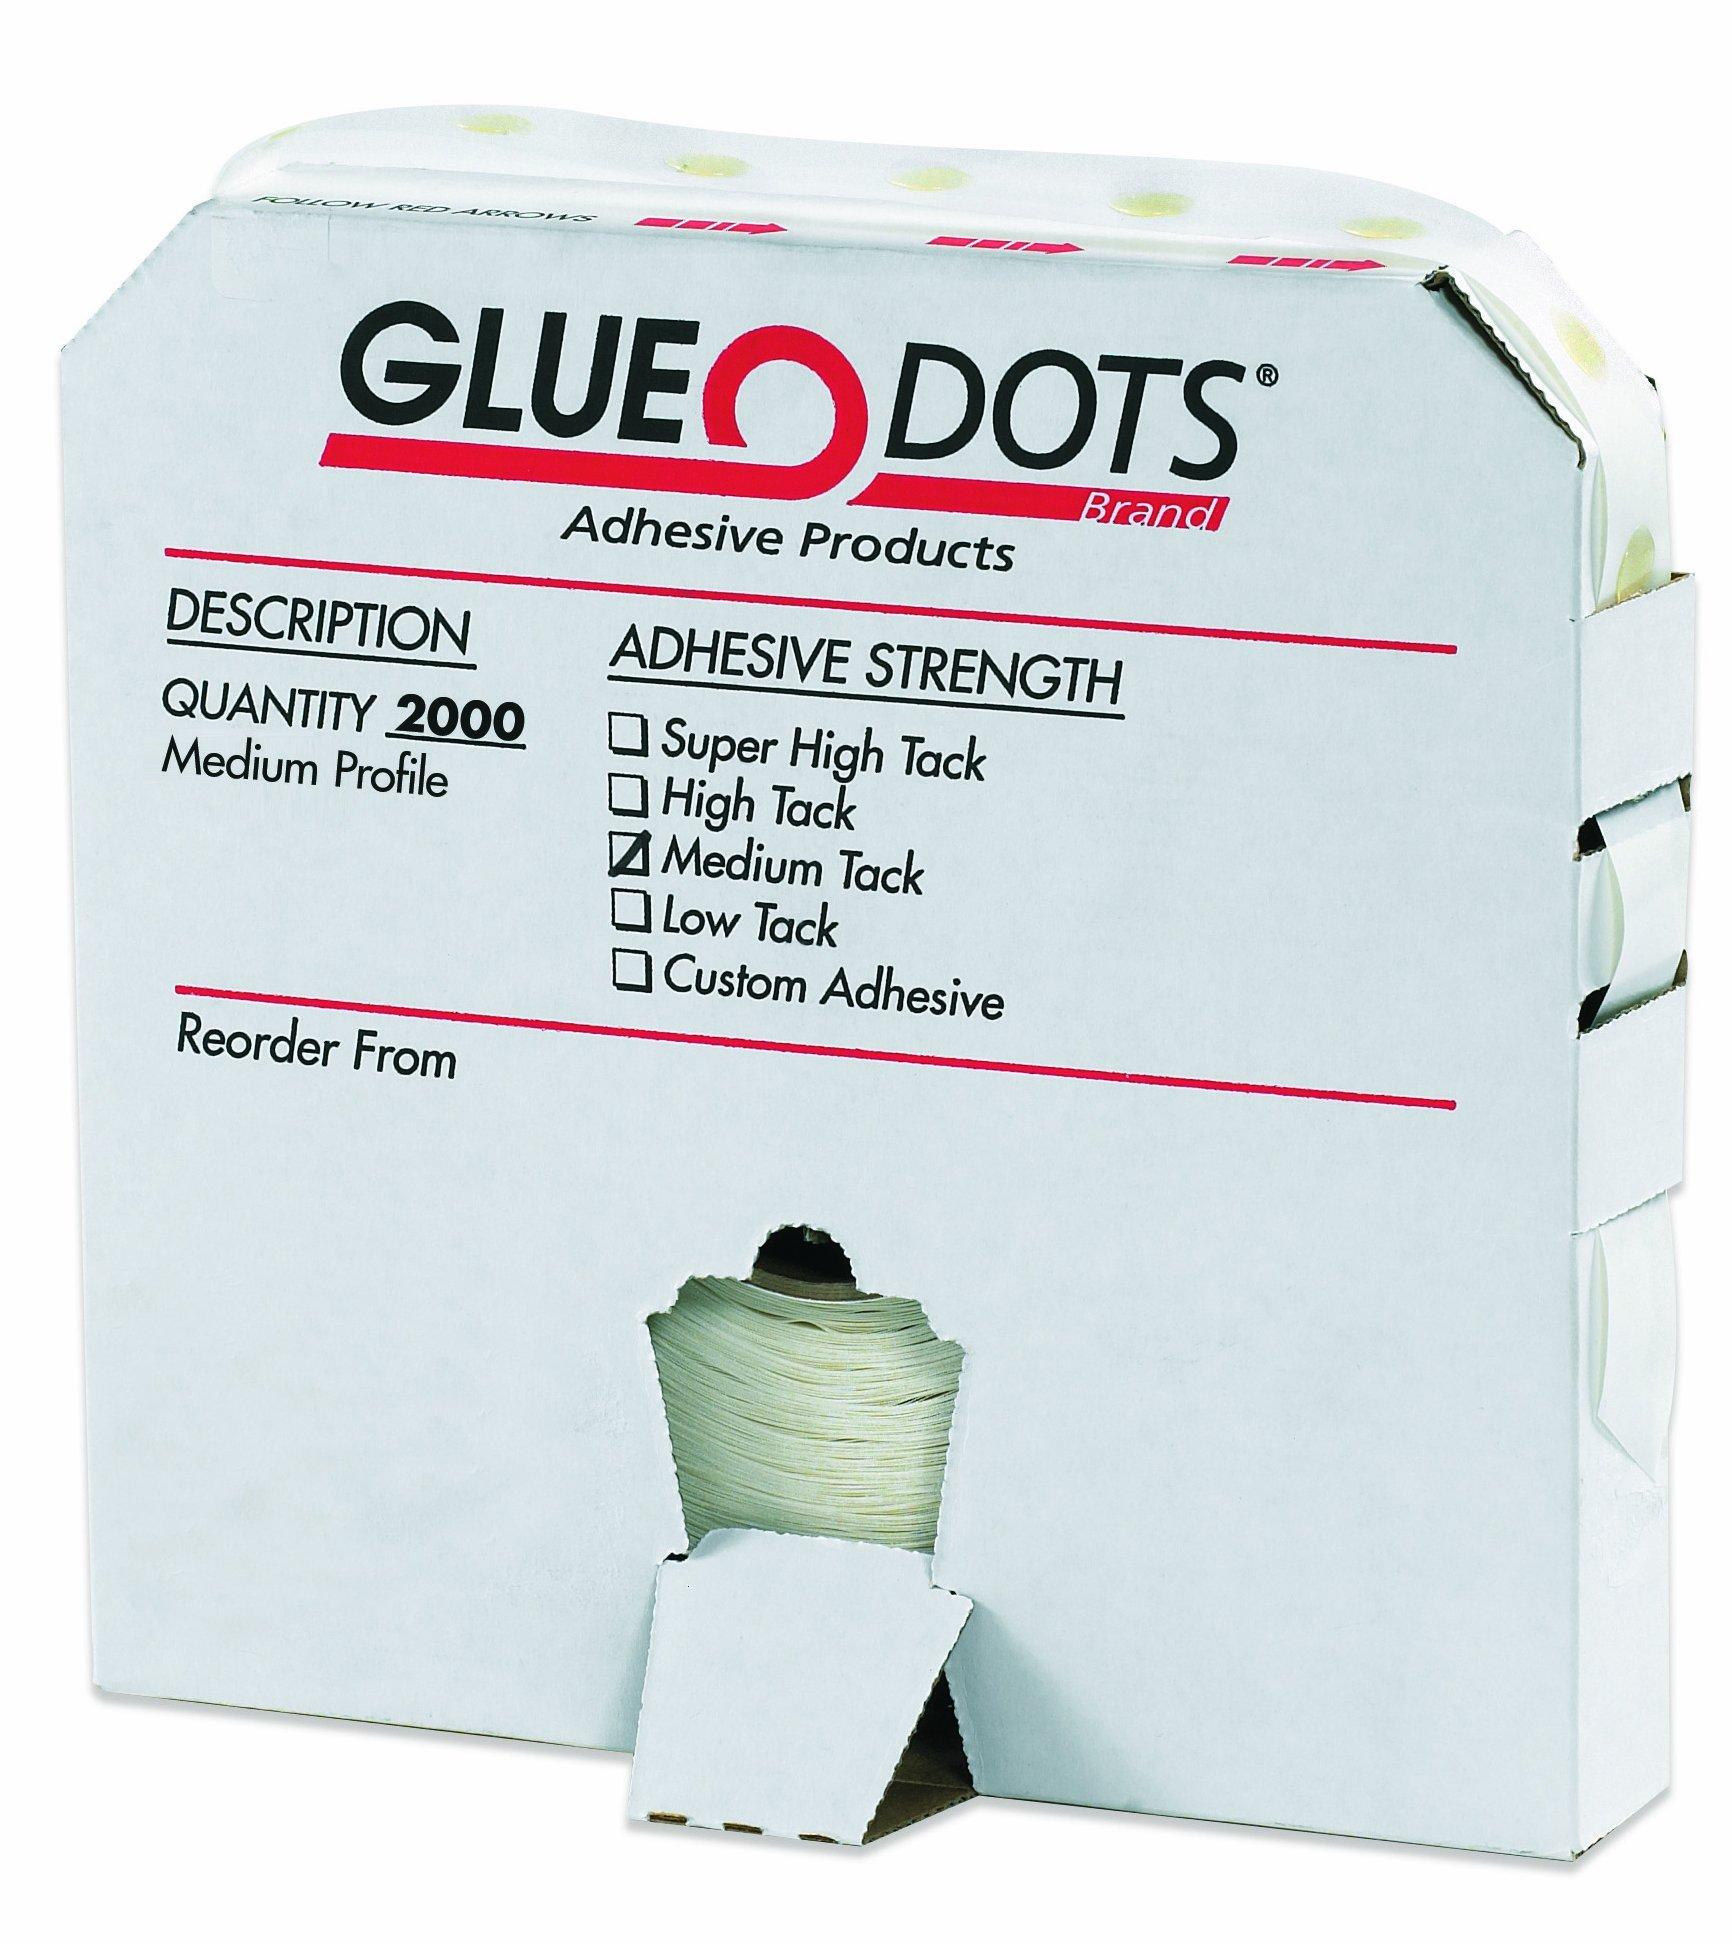 Glue Dots Medium Profile Medium Tack Glue Dot, 1/2'' Diameter x 1/32'' Thick, Case of 2000 (GD114) by Glue Dots